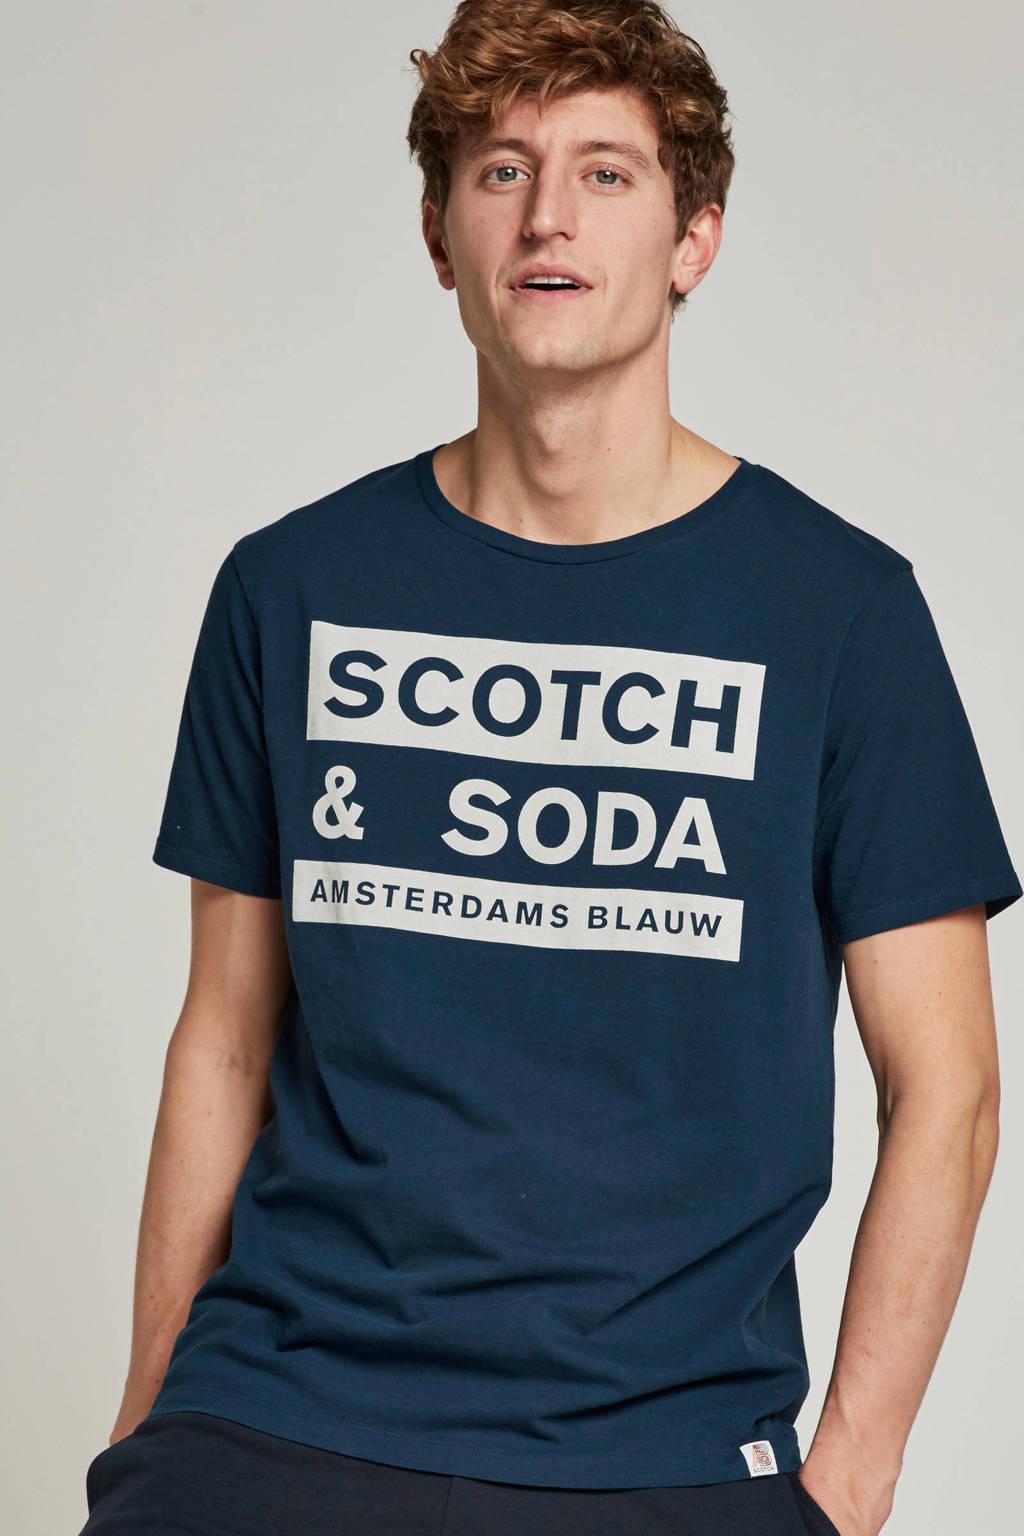 Scotch & Soda T-shirt, Blauw